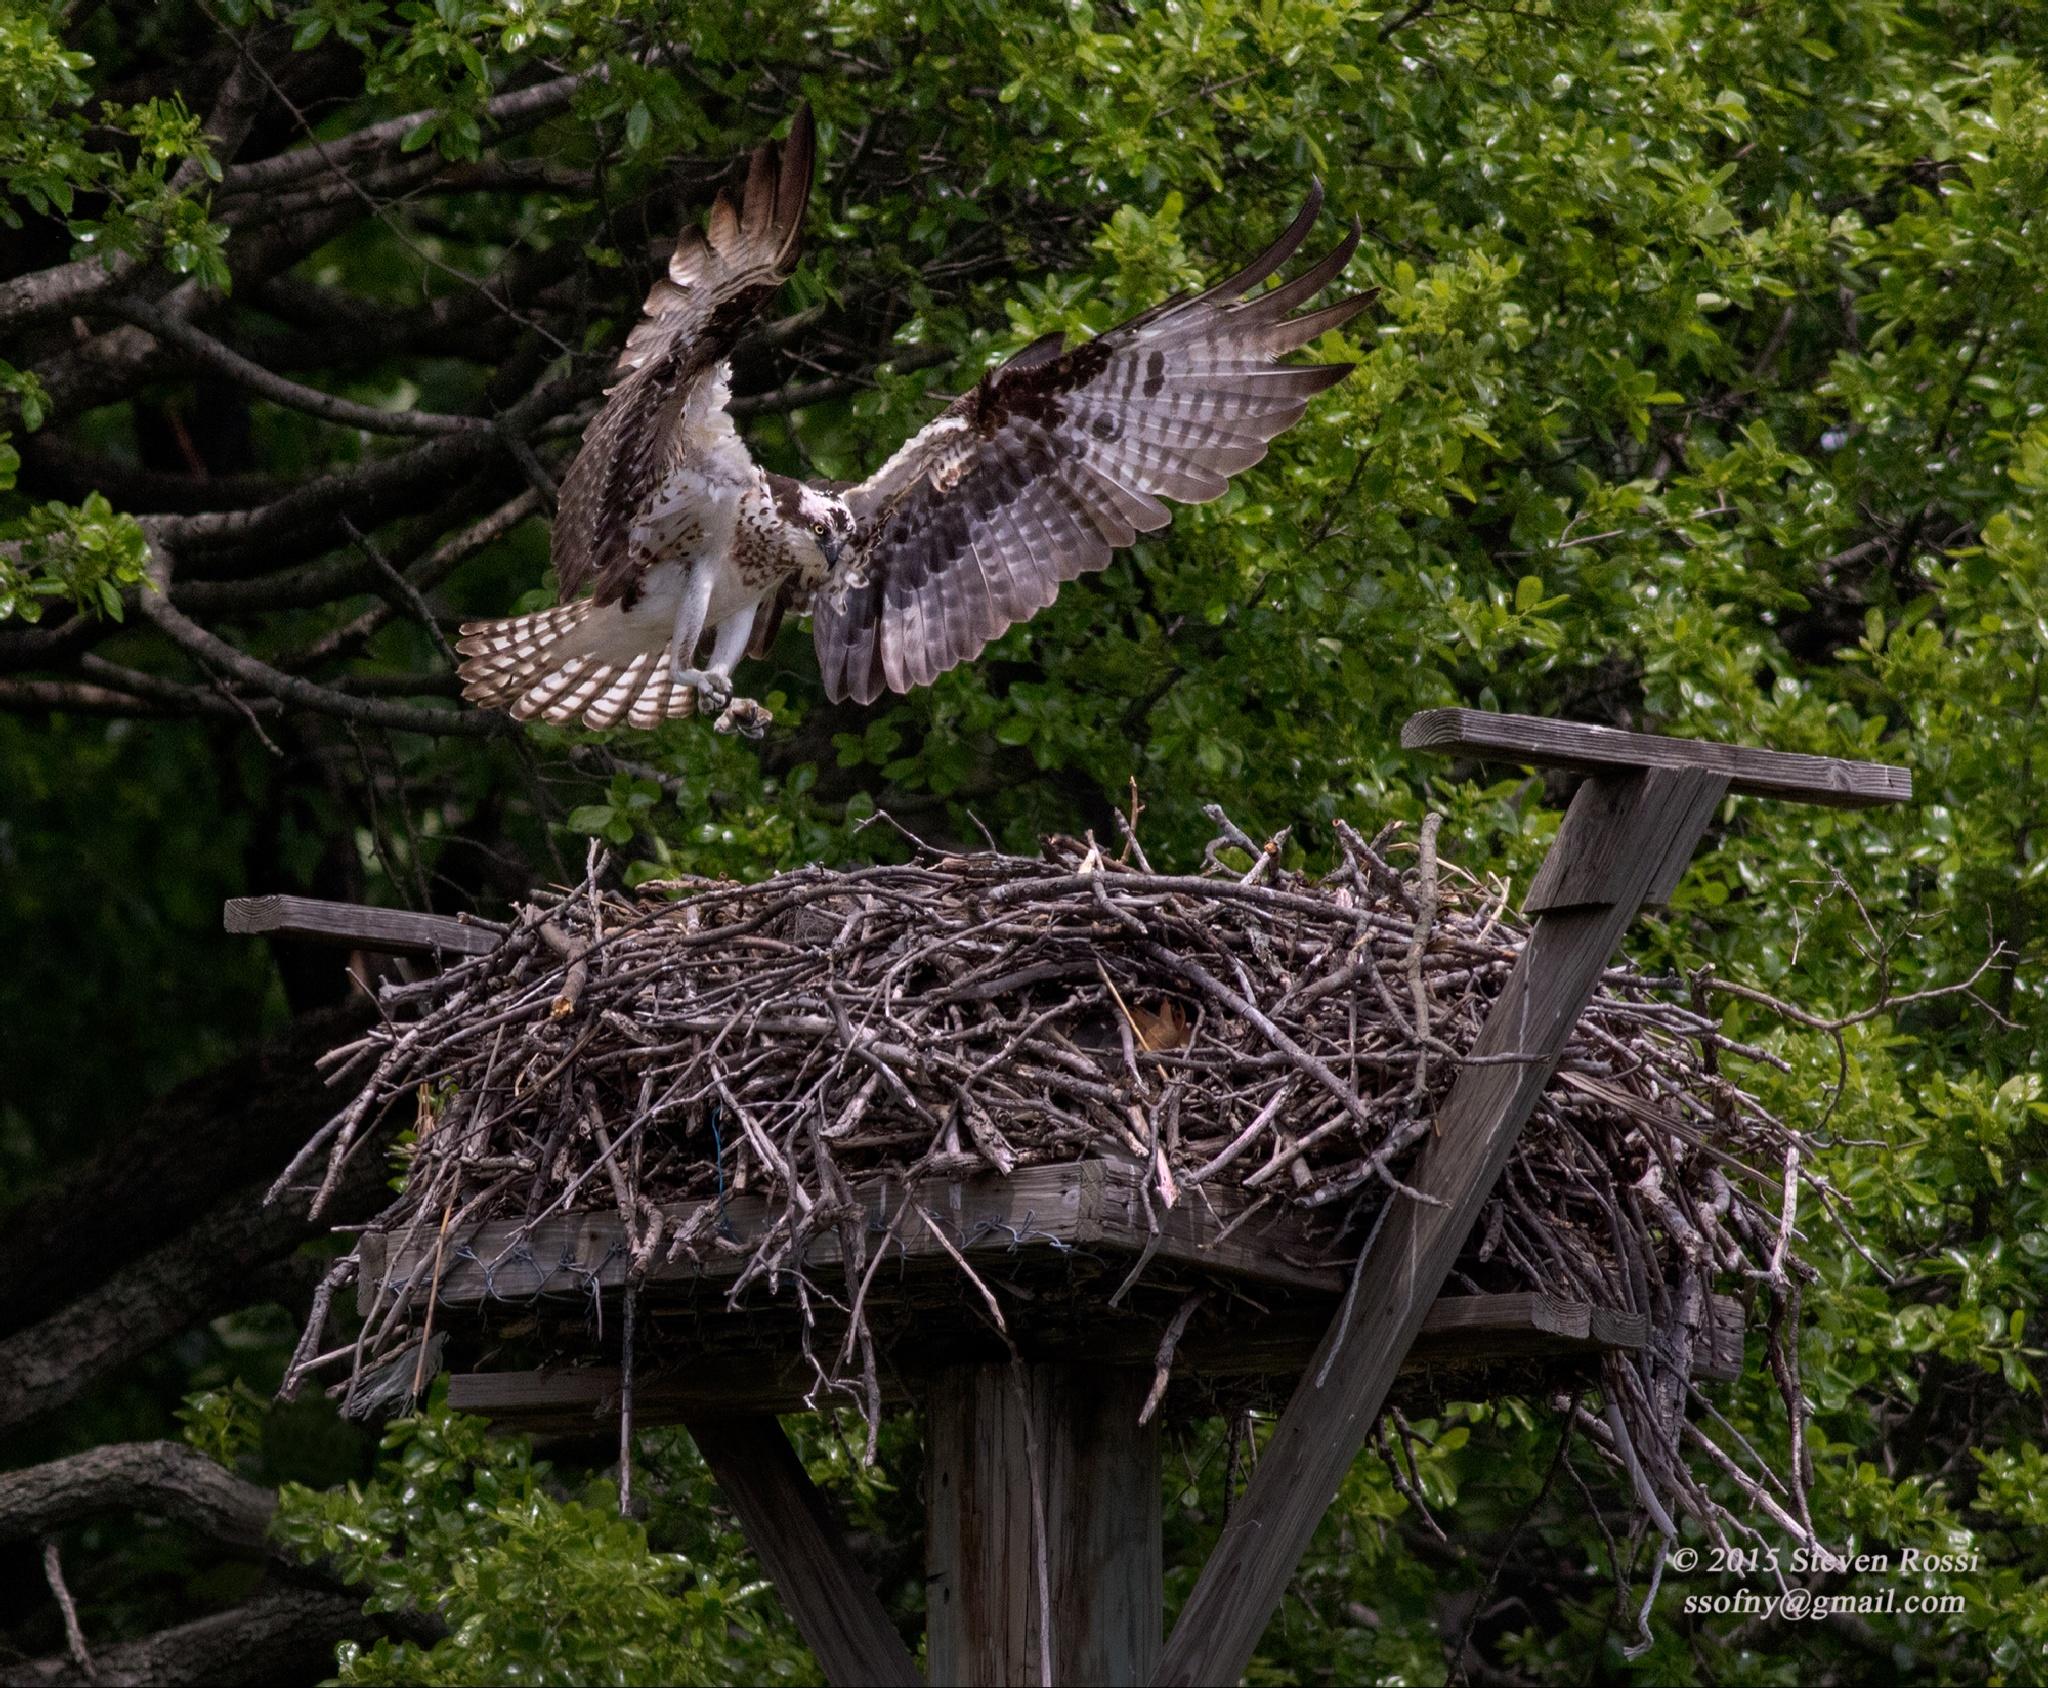 osprey by Steven Rossi